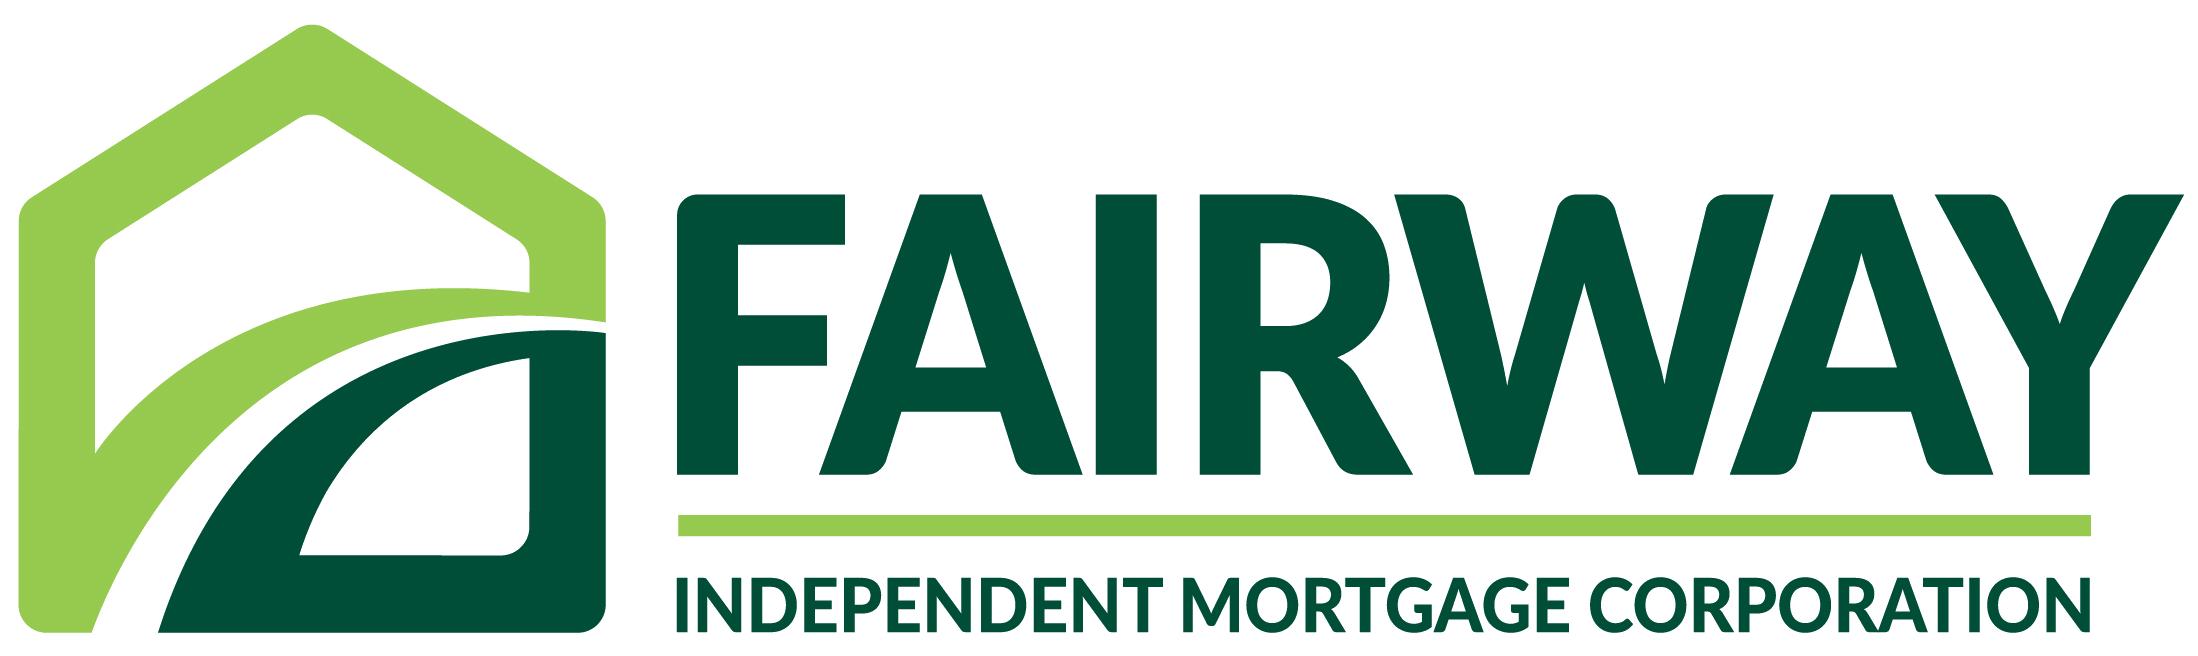 The Edgin Team at Fairway Independent Mortgage logo